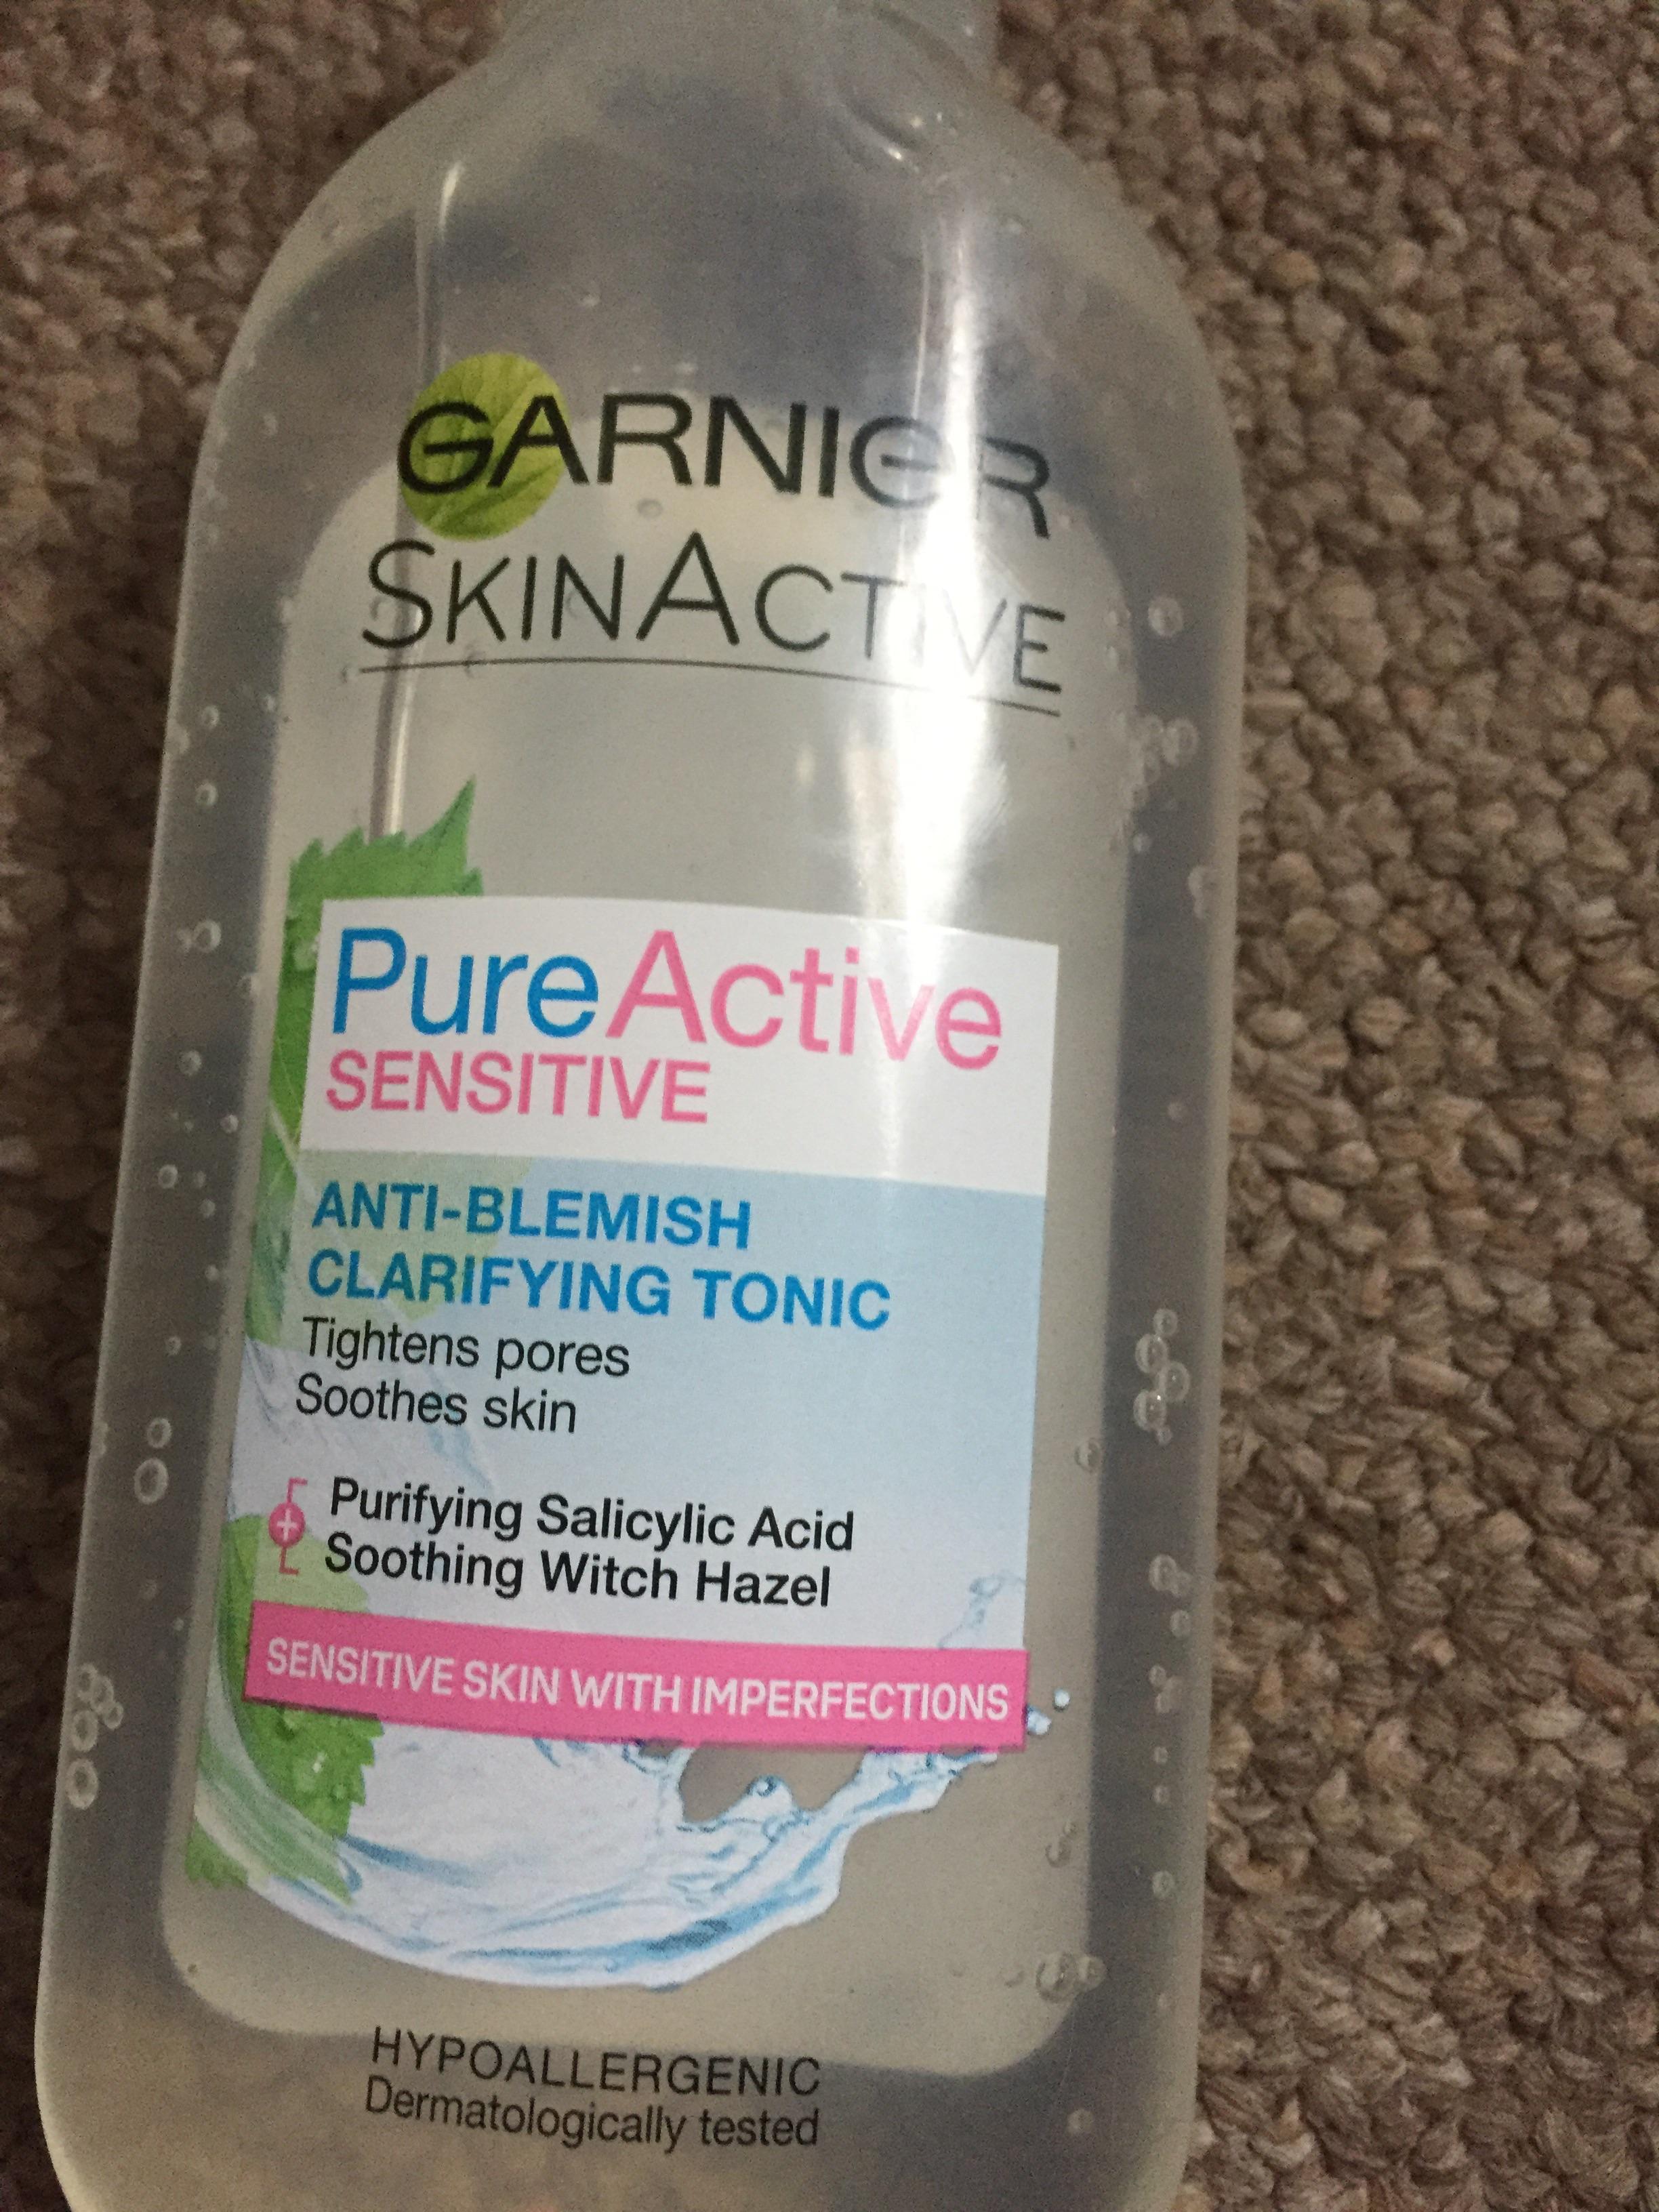 Garnier pure active sensitive - 50p instore @ Superdrug